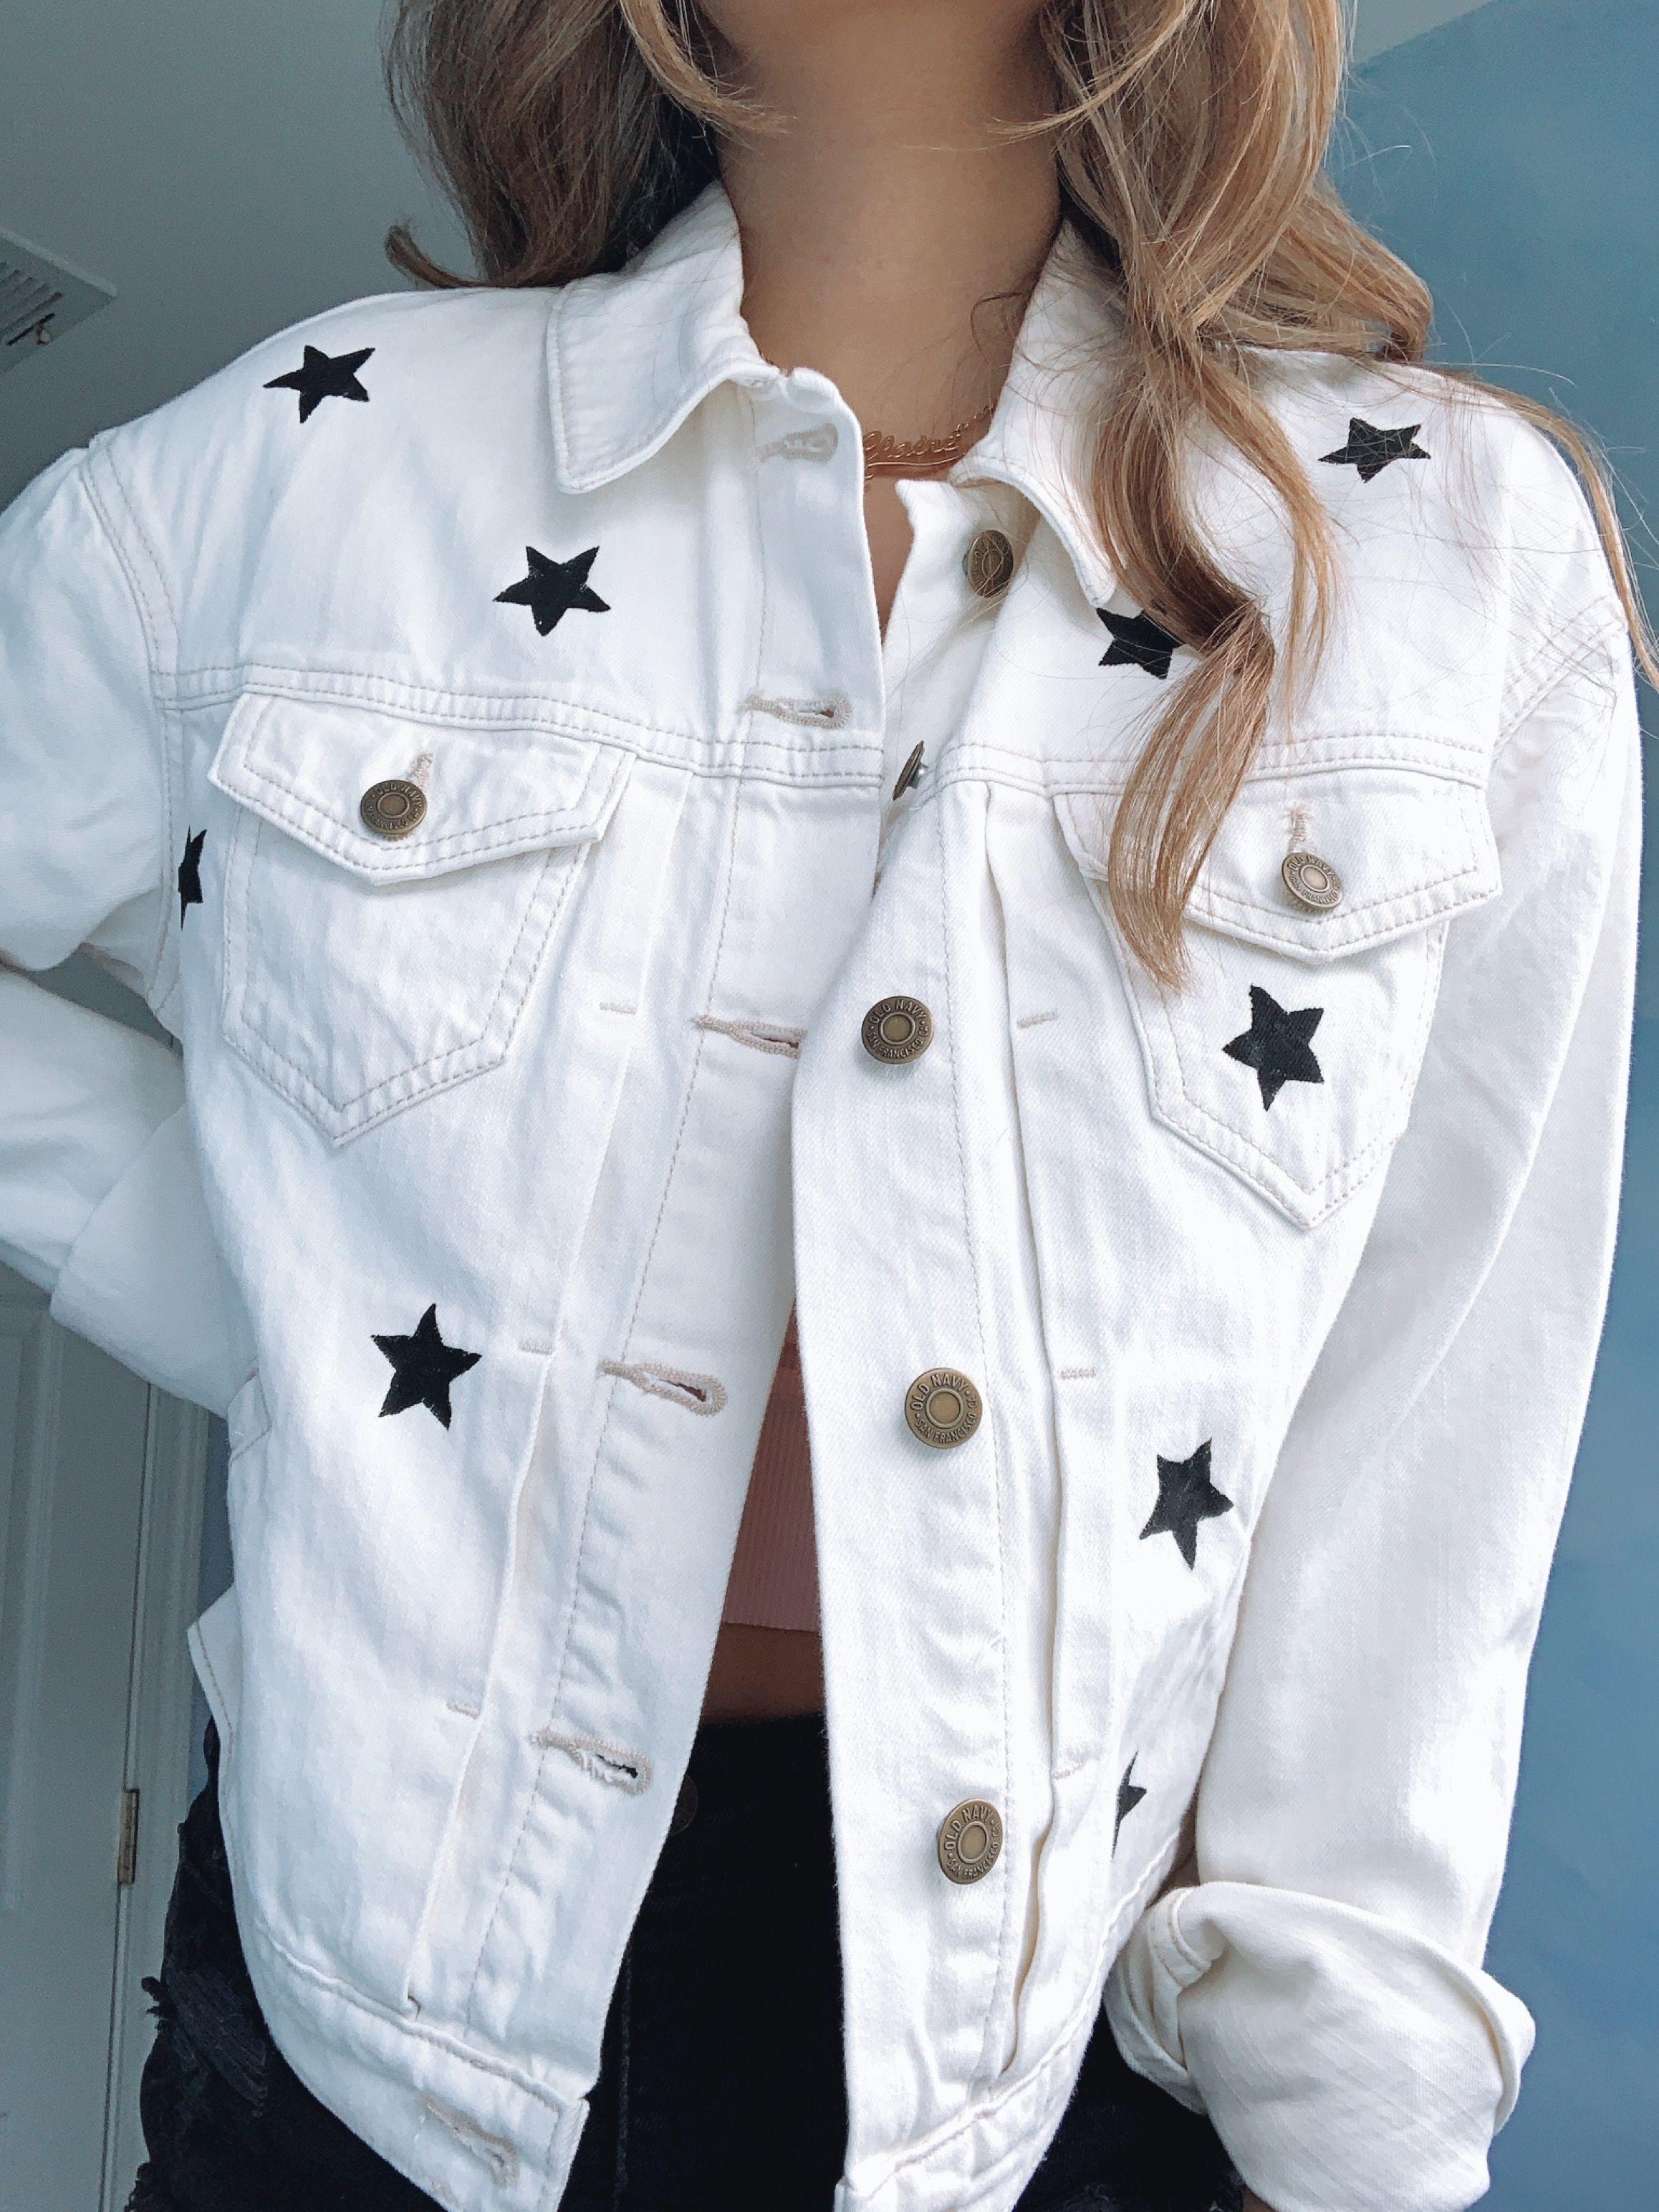 Black Stars Cropped Denim Jacket In Off White Denim Jacket White Denim Jacket Cropped Denim Jacket [ 3088 x 2316 Pixel ]